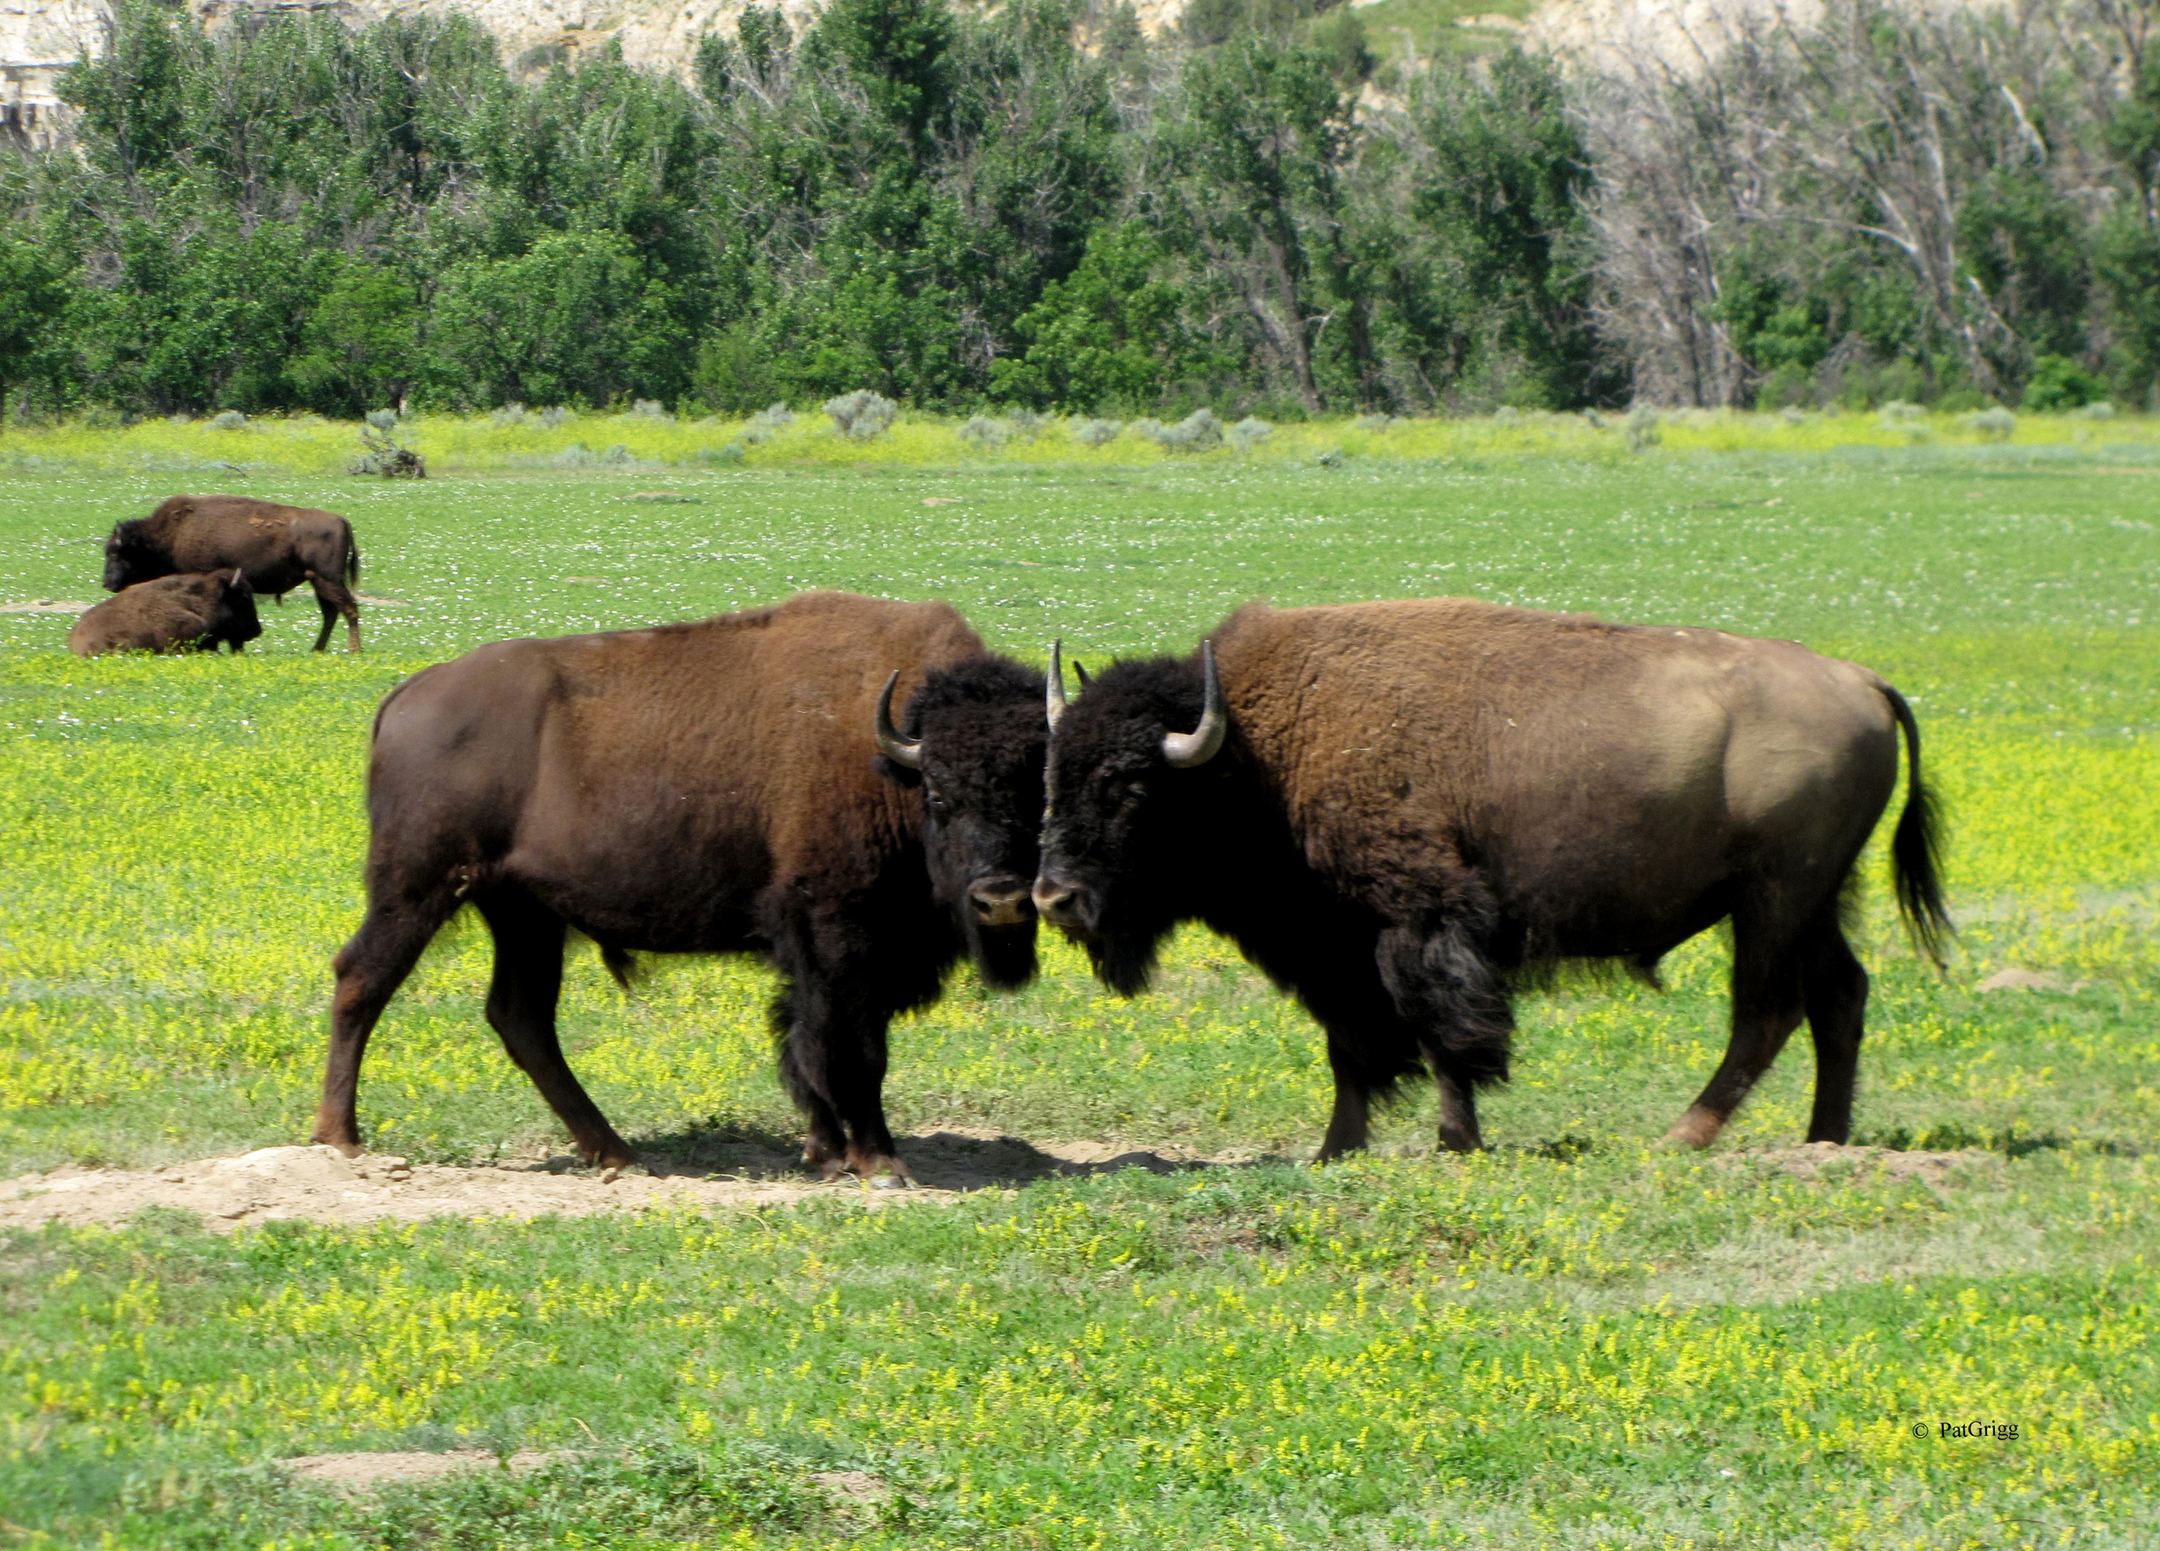 spirit of the american bison lives in teddy roosevelt national park cnn travel